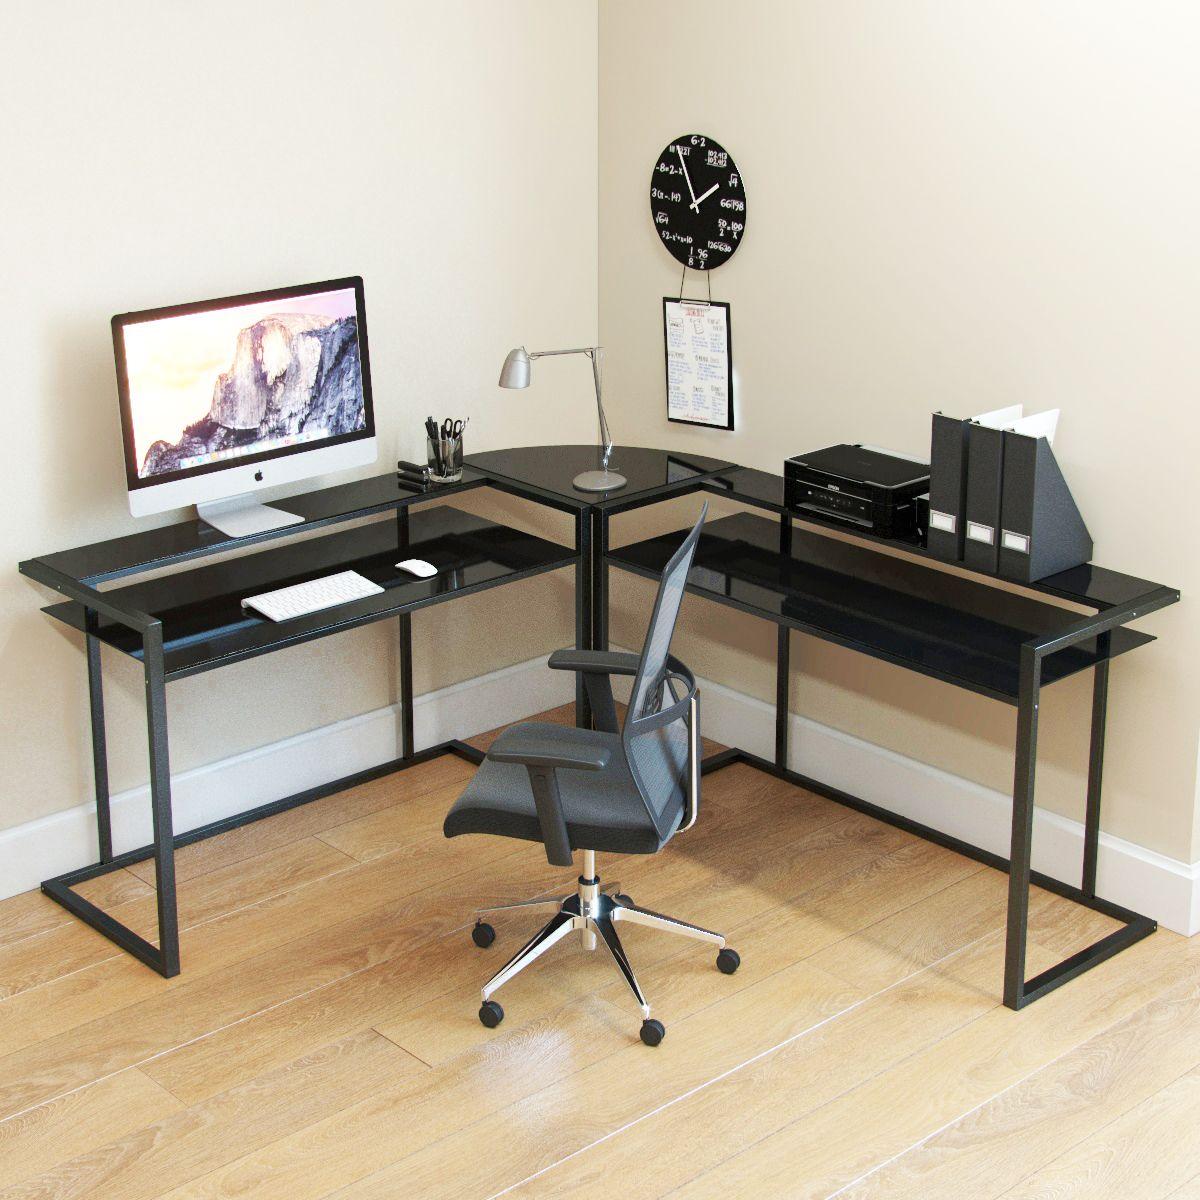 Belmac 3 Piece Corner C Frame L Shaped Computer Desk In Black Glass And Black Frame Computer Desk Design Modern L Shaped Desk Desk Design